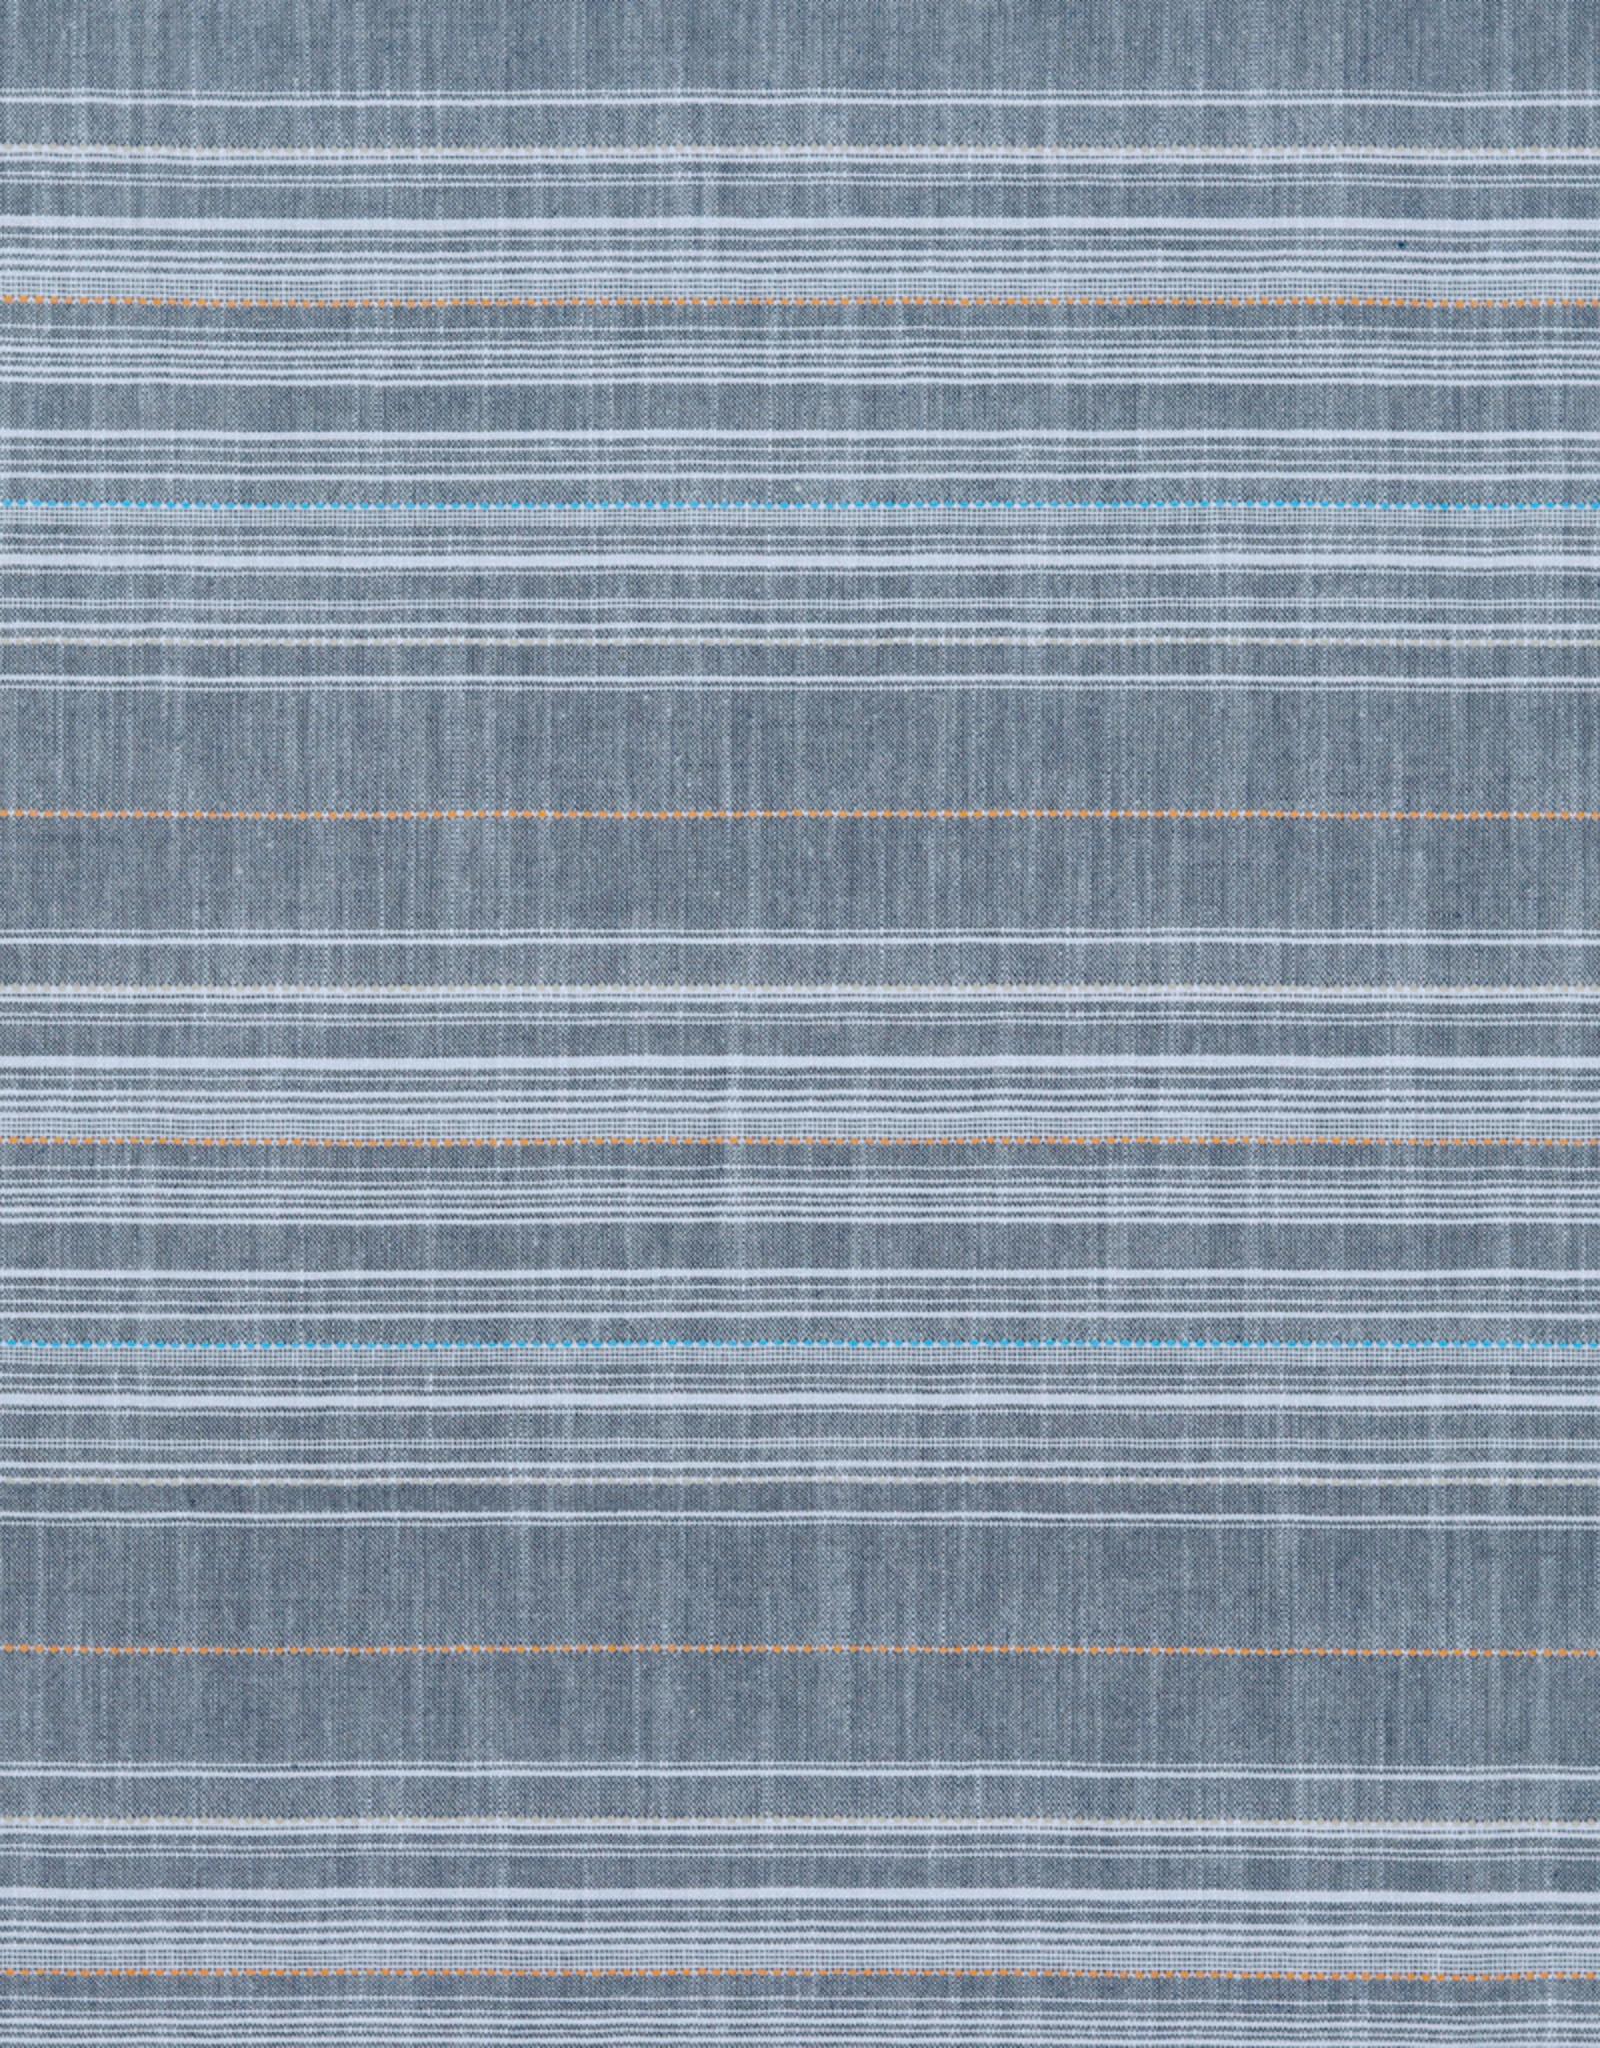 Katoen-Viscose - Chambray Blue